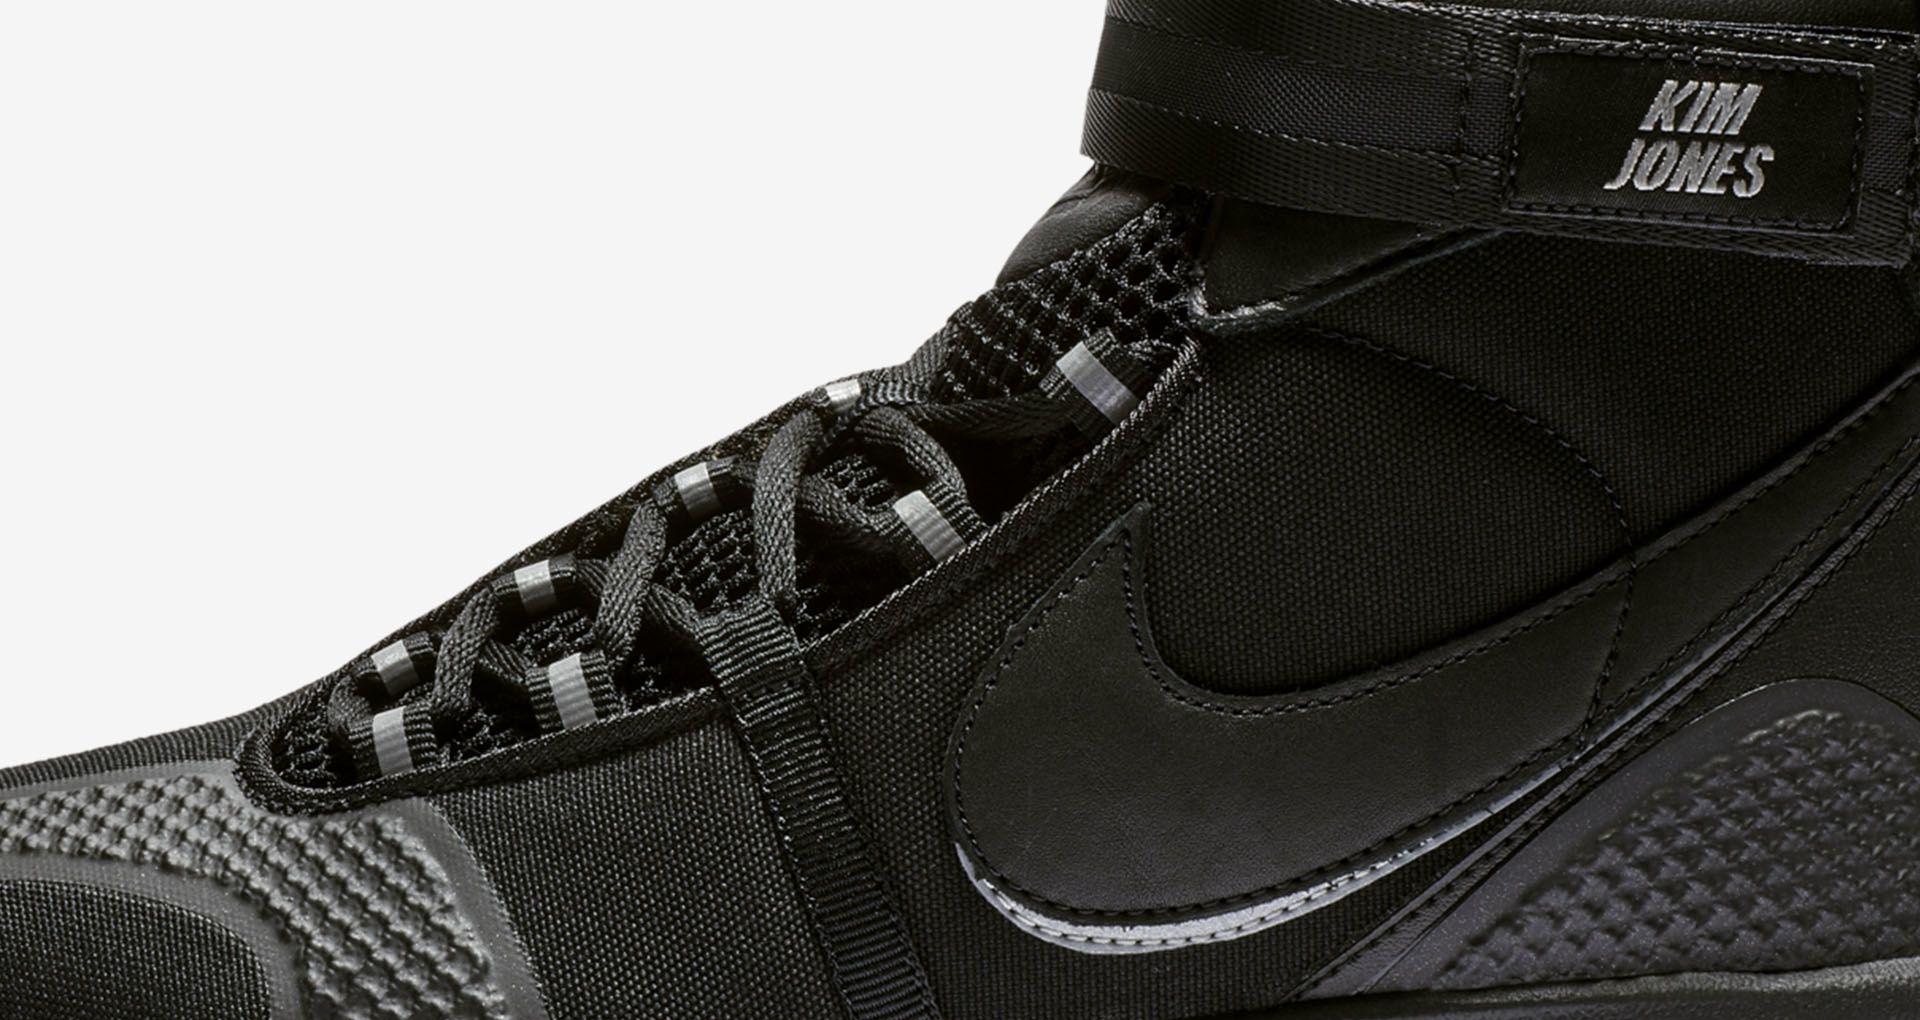 b985b95f5 Nike Air Max 360 High Kim Jones  Triple Black  Release Date. Nike+ ...